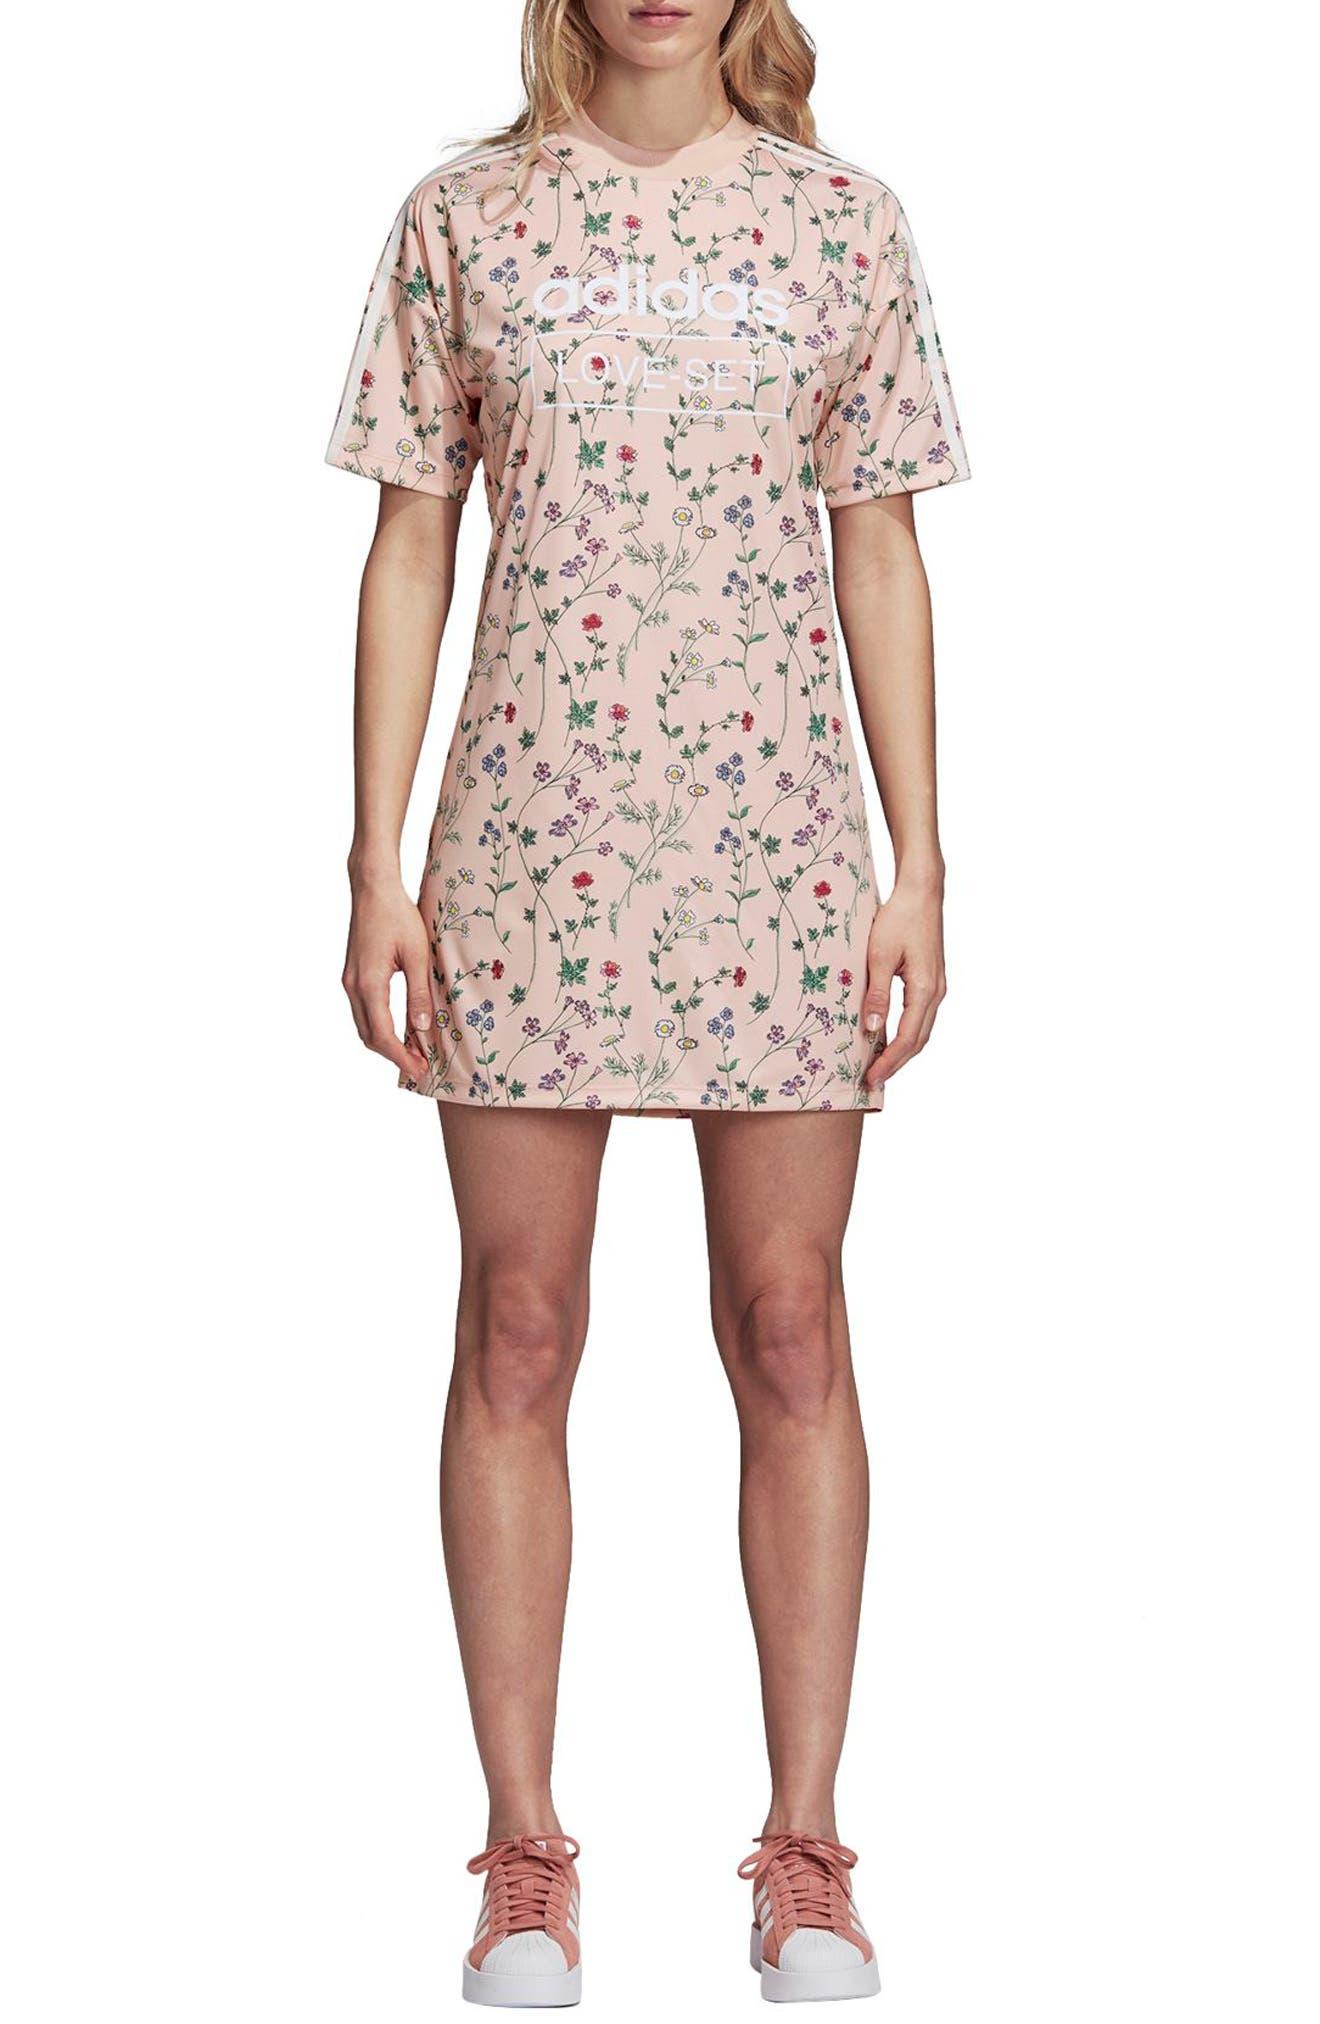 Originals Floral Graphic Dress,                         Main,                         color, Pink - Flower Aop